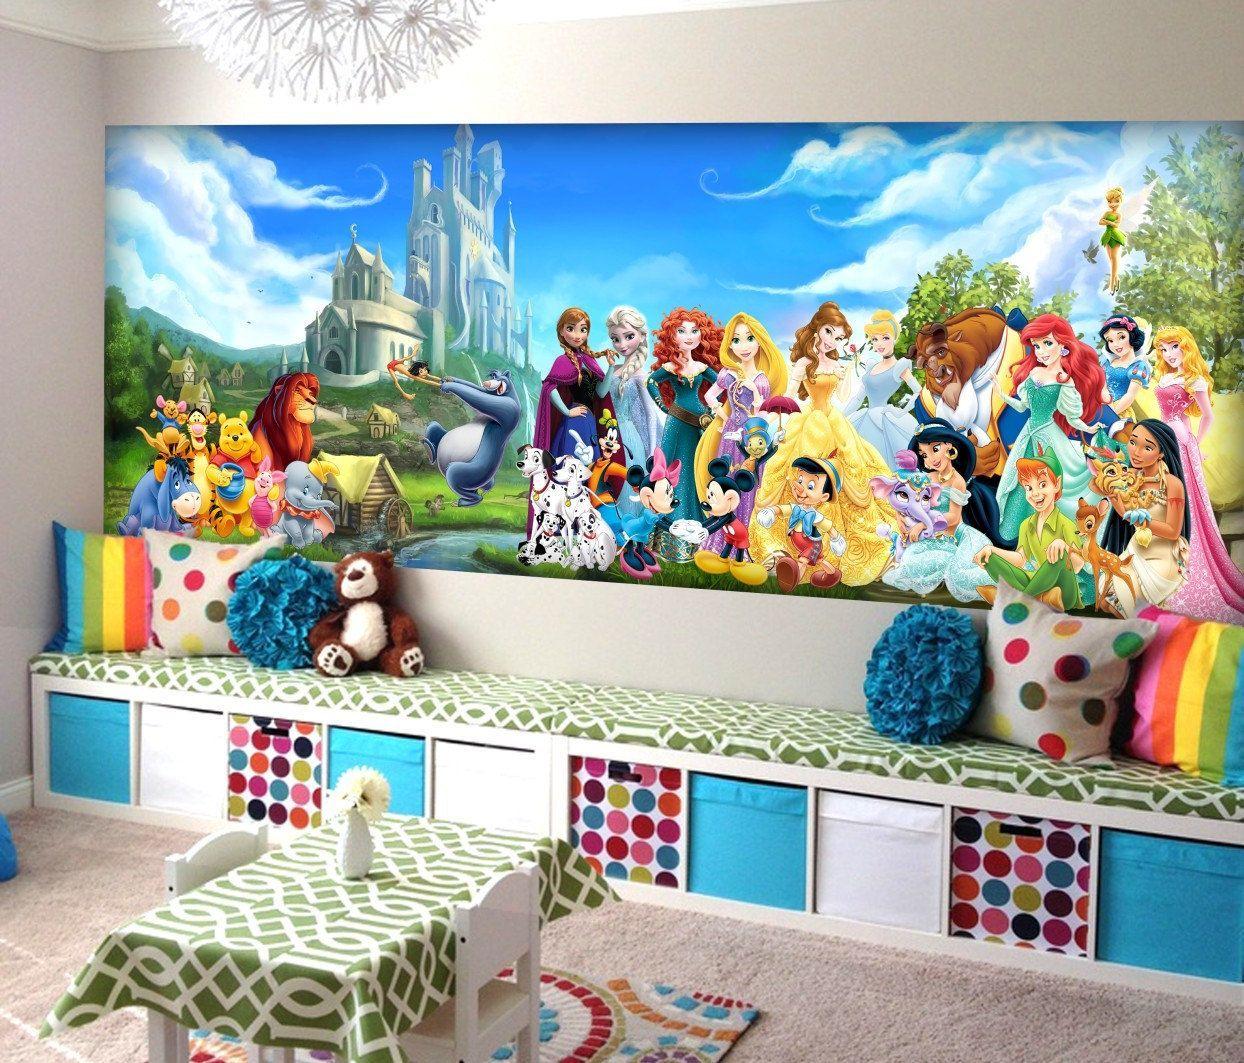 Disney Charachters Wall mural Vinyl Mural Wallpaper Wall